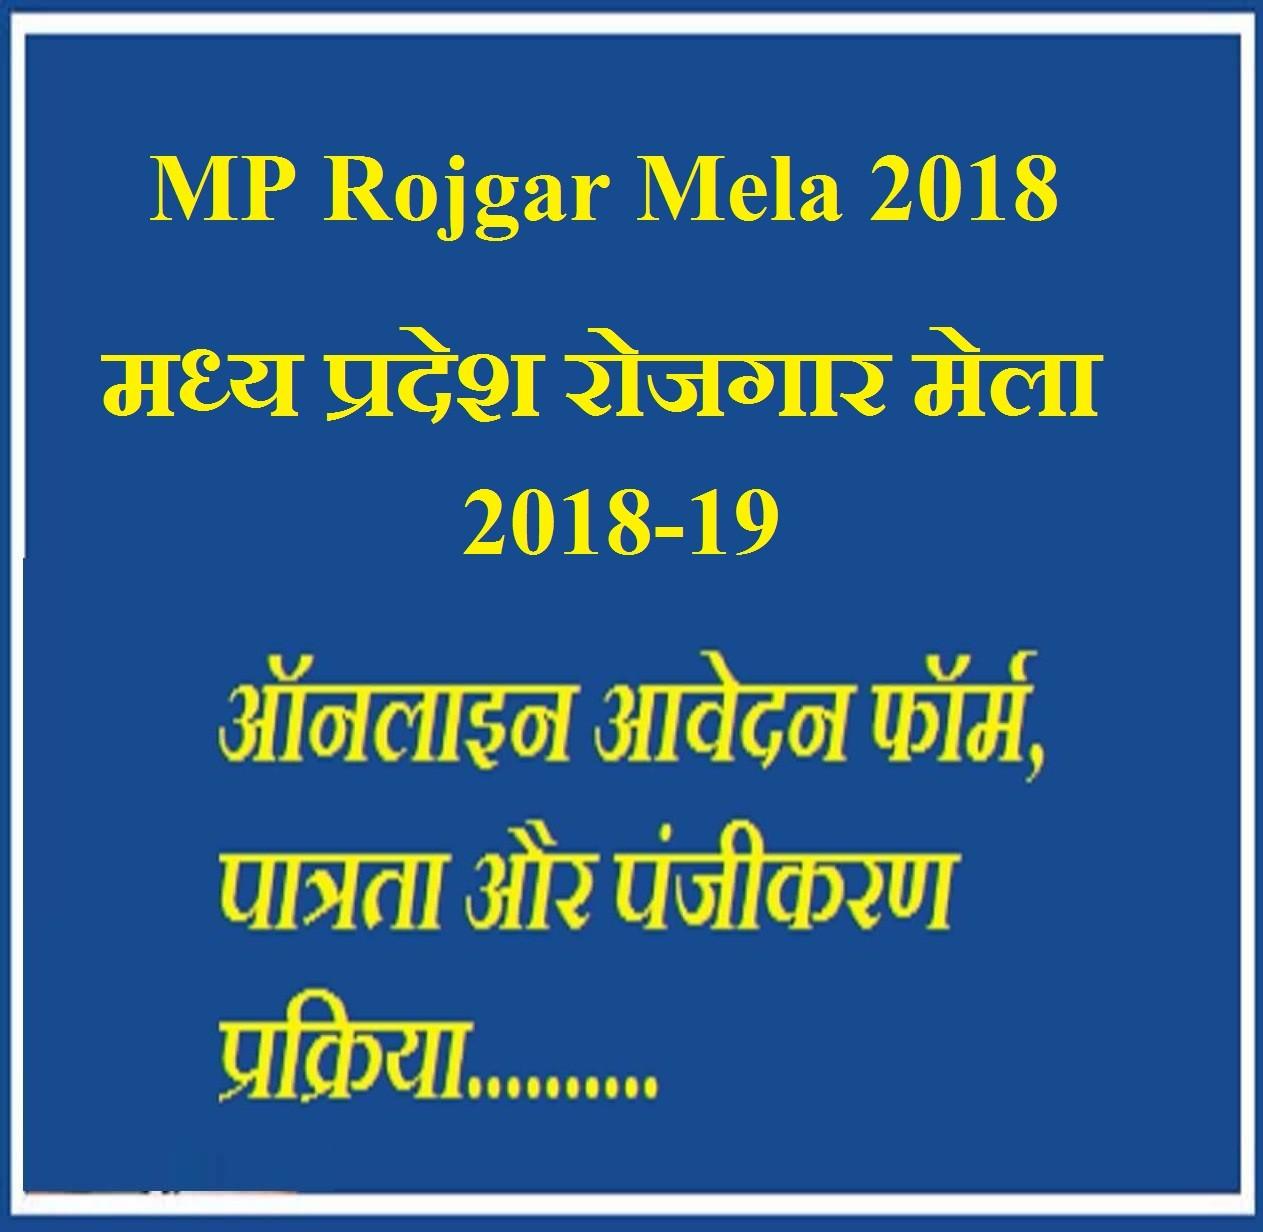 Rojgar Mela MP 2018-19